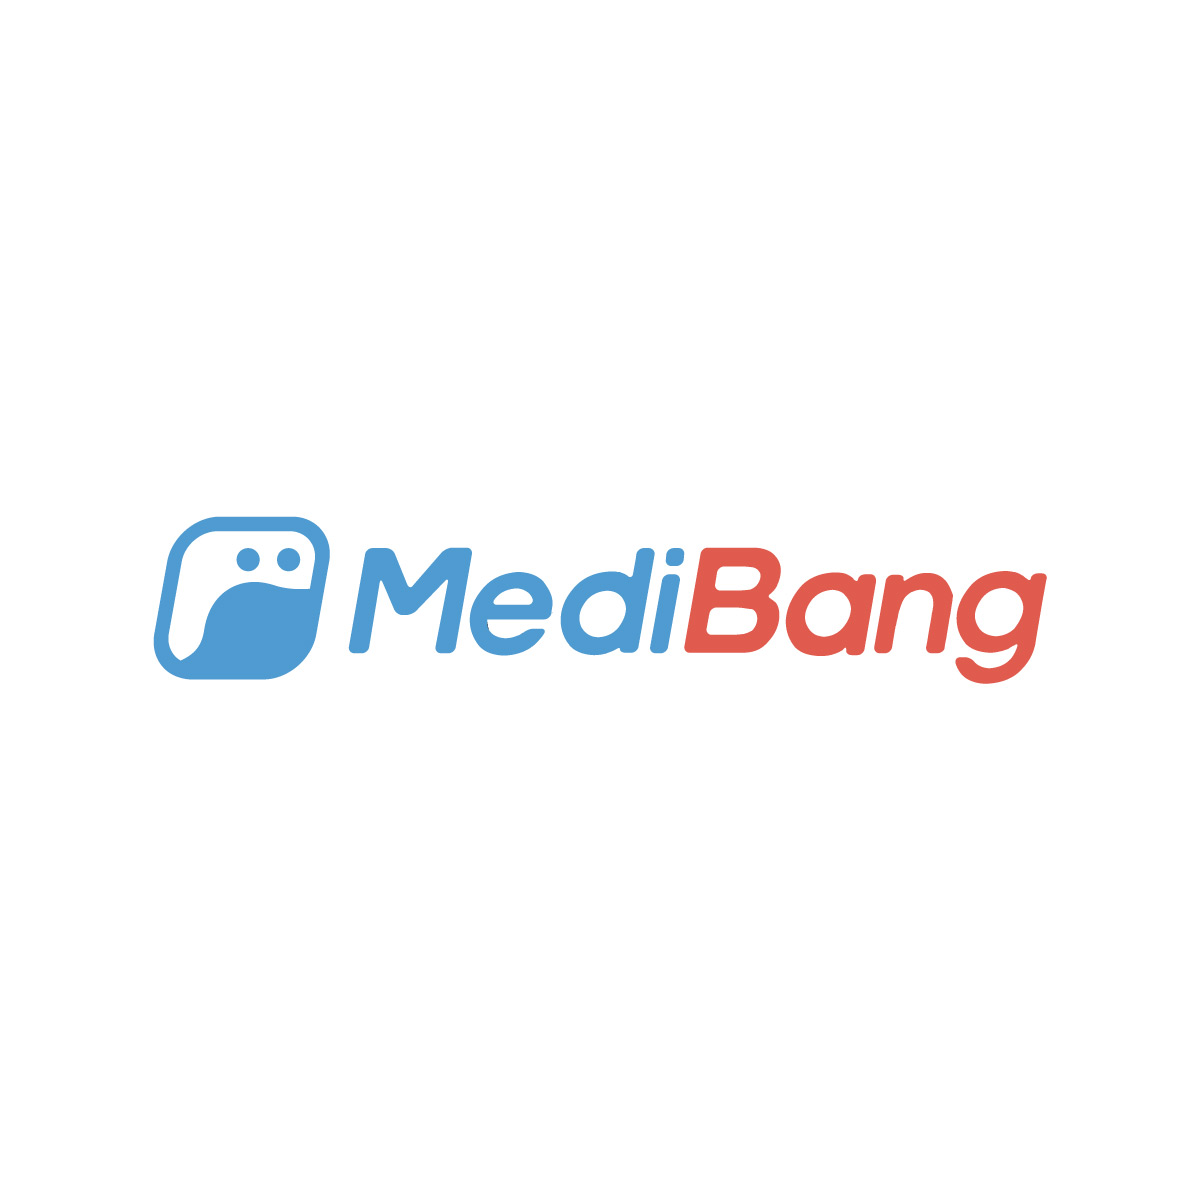 MediBang